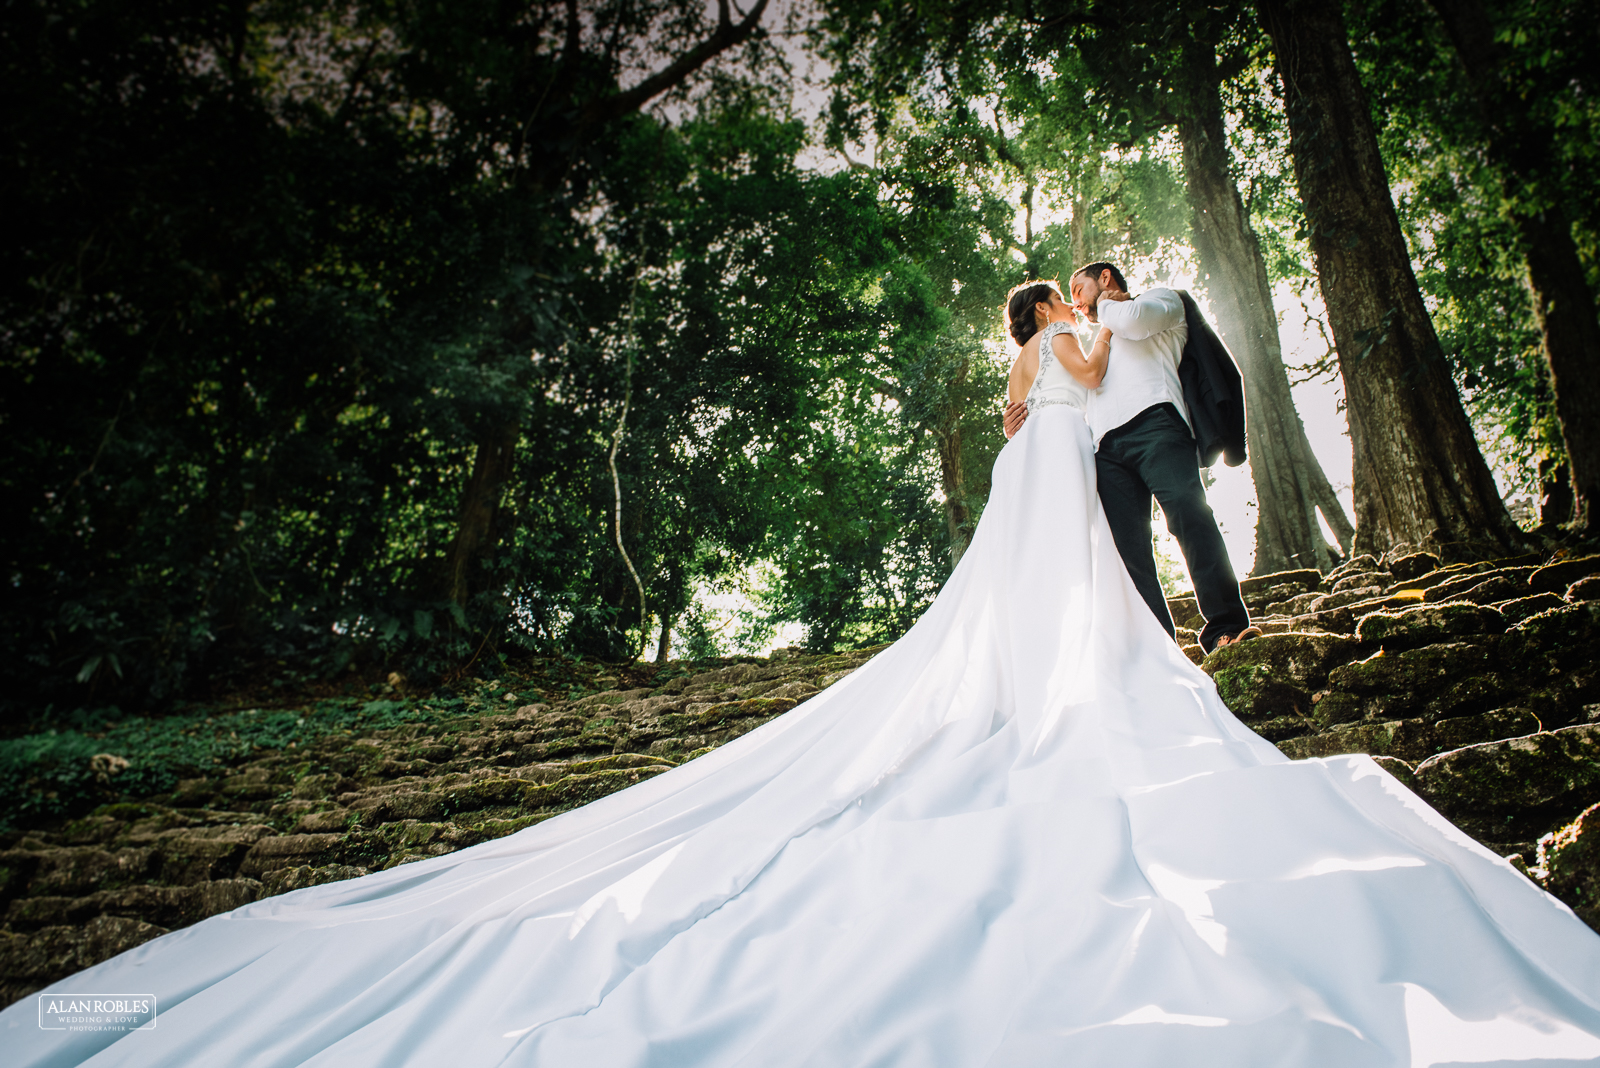 Fotografo de bodas Alan Robles-Pre boda Chiapas-28